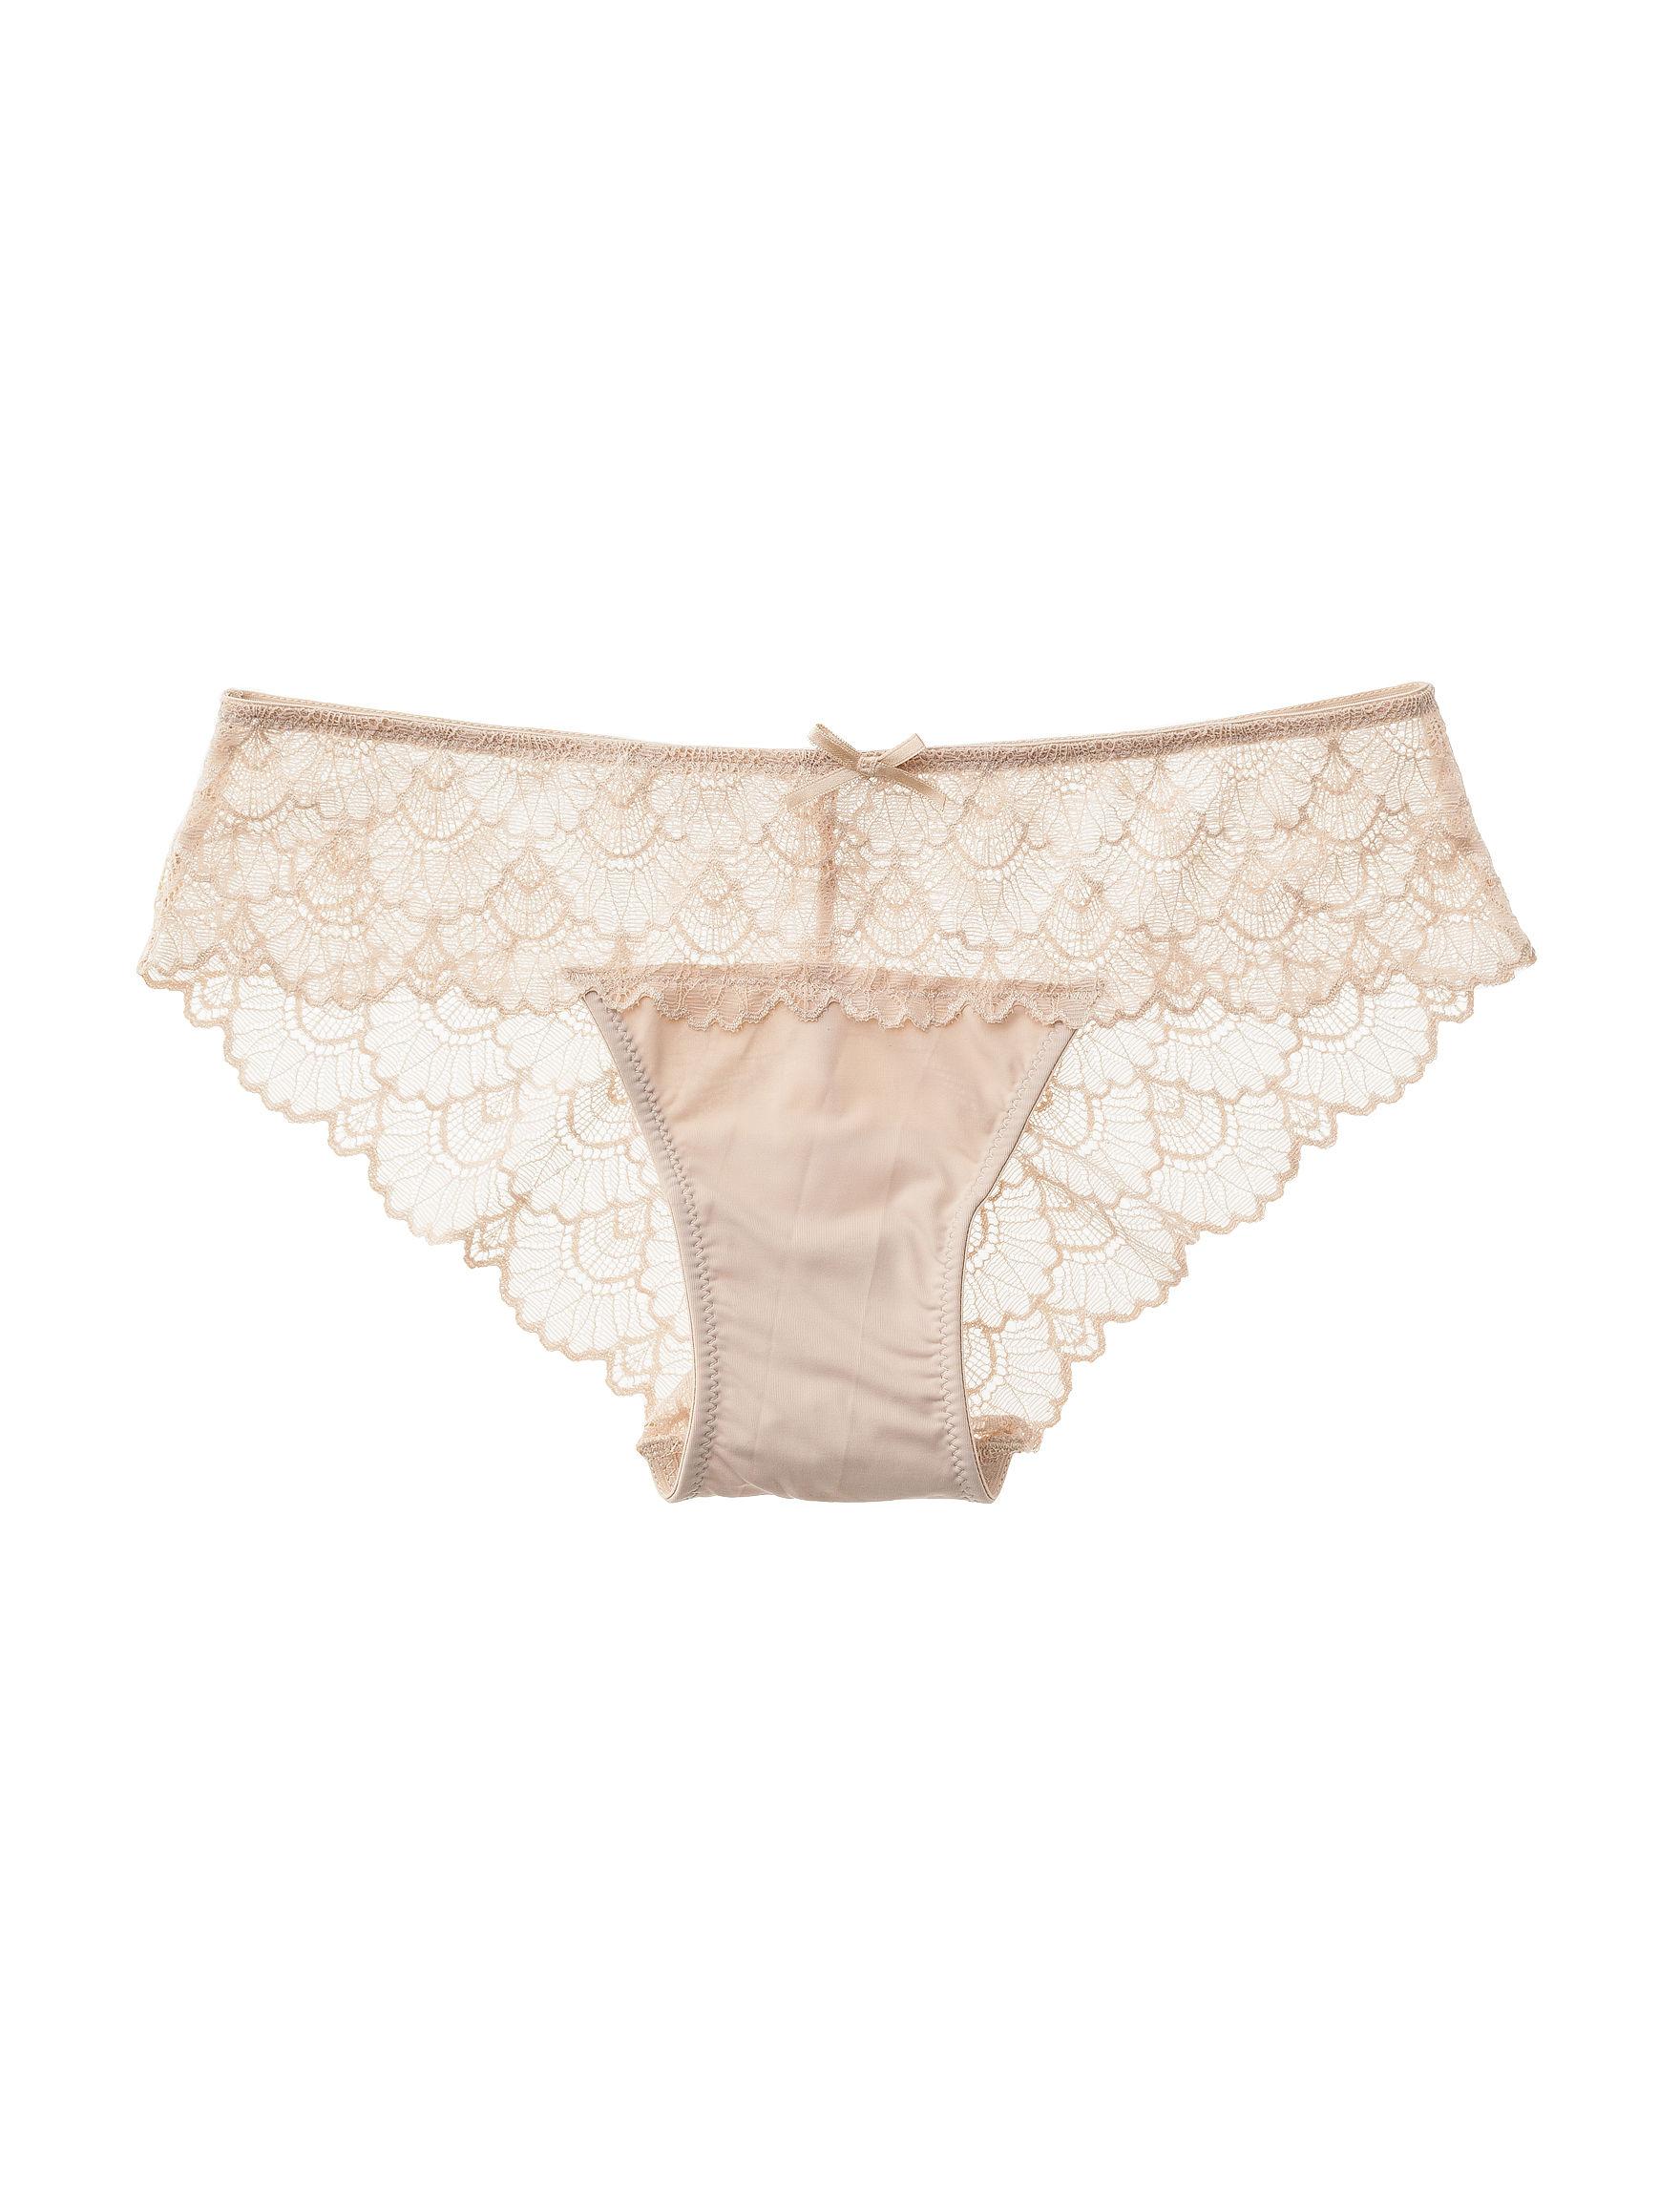 Rene Rofe Beige Panties Bikini High Cut